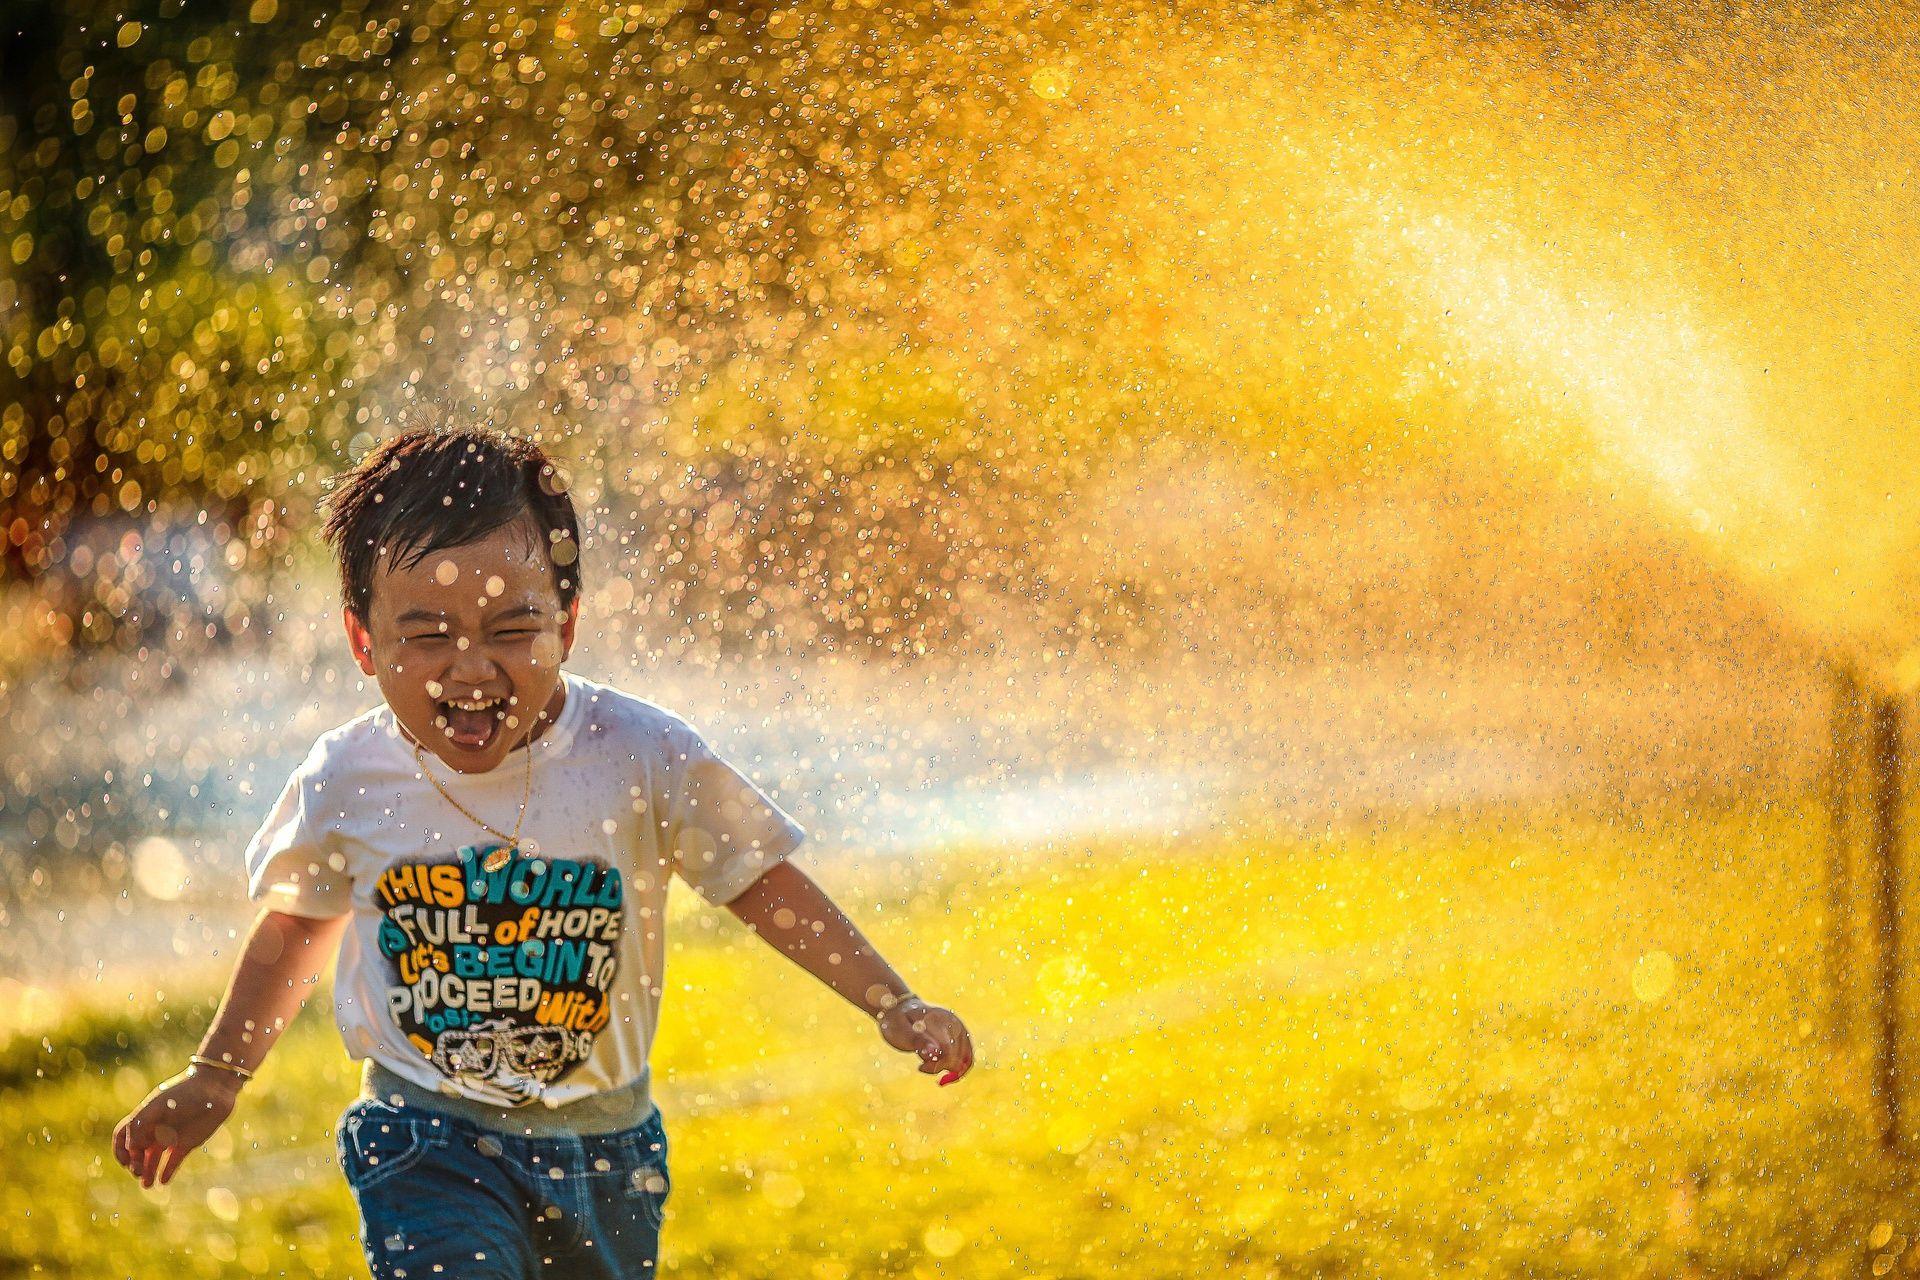 sites/74247825/boy water_he.jpg